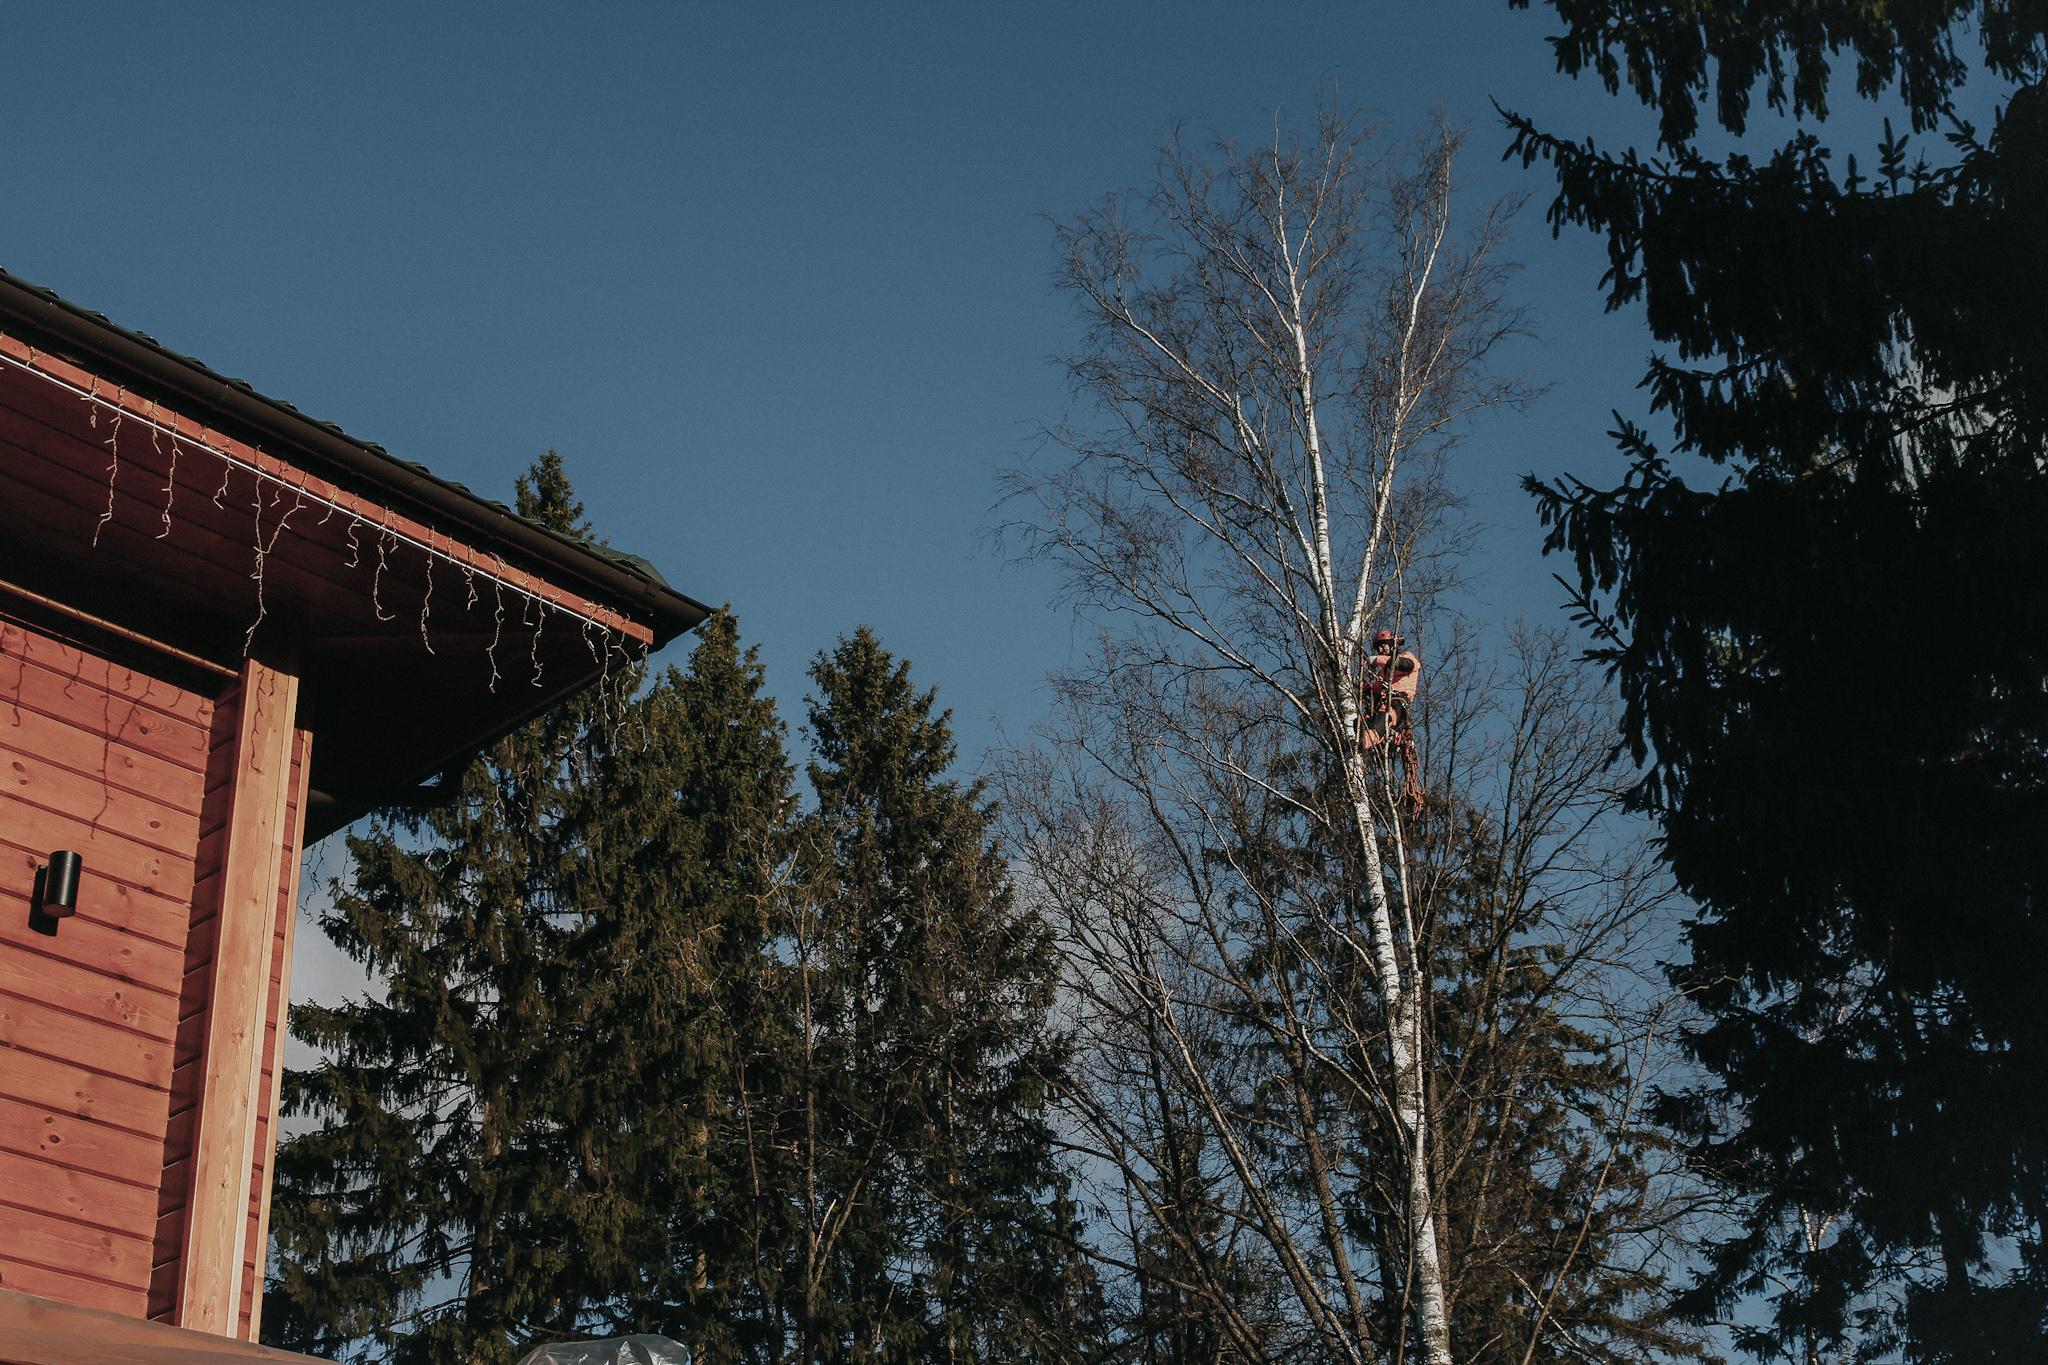 Обрезка макушек на шести деревьях в поселке Аметист, Наро-Фоминский район.